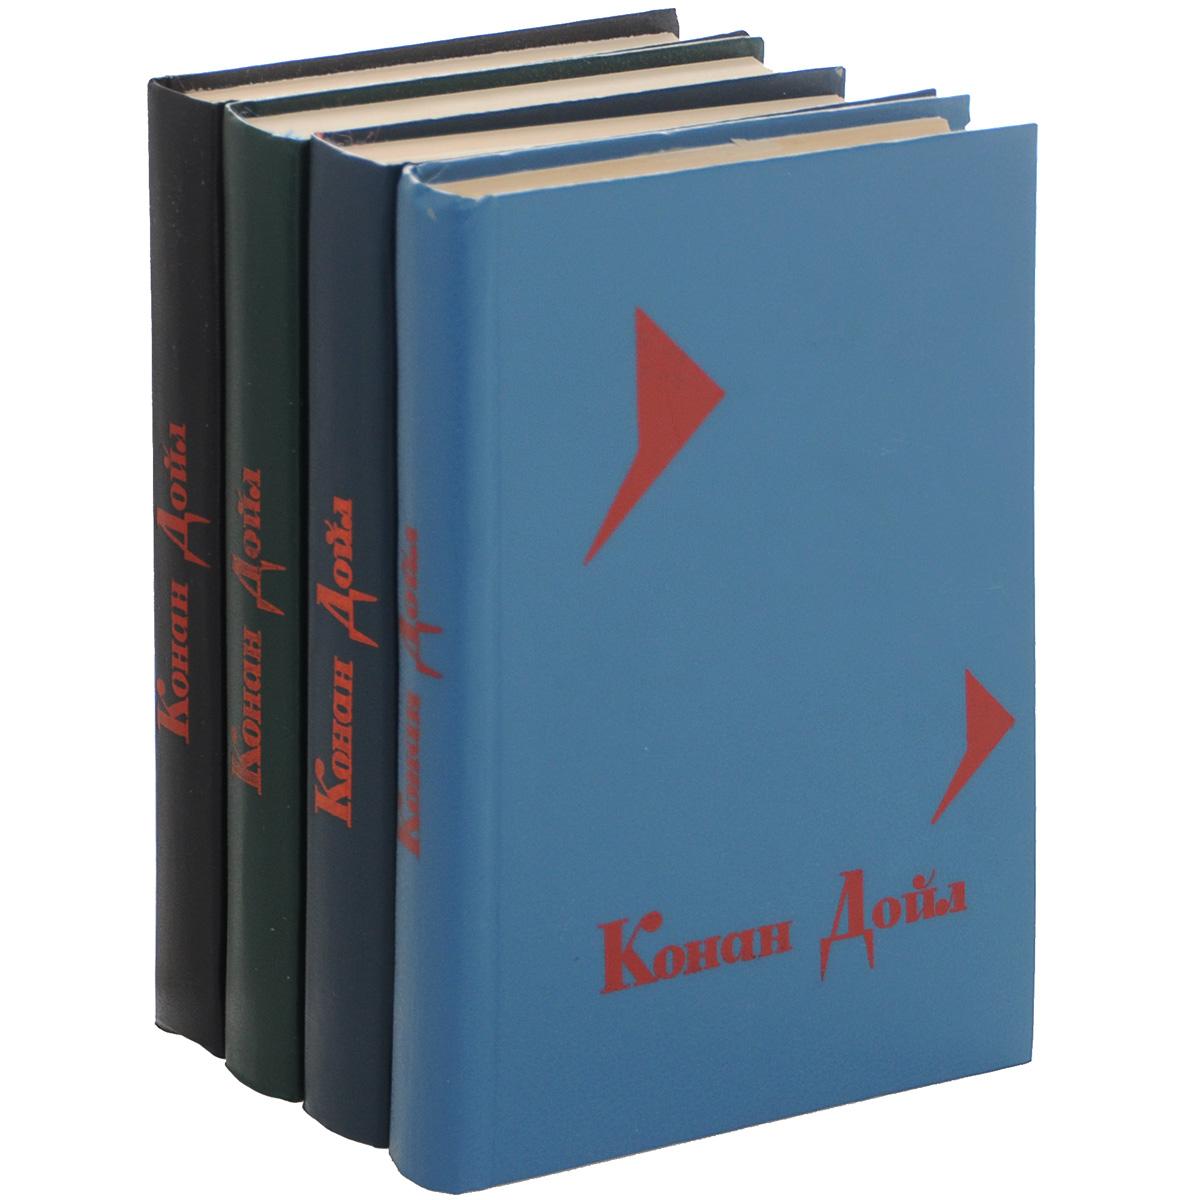 Артур Конан Дойл Артур Конан Дойл. Собрание сочинений. В 4 томах (комплект из 4 книг) артур конан дойл алое кольцо